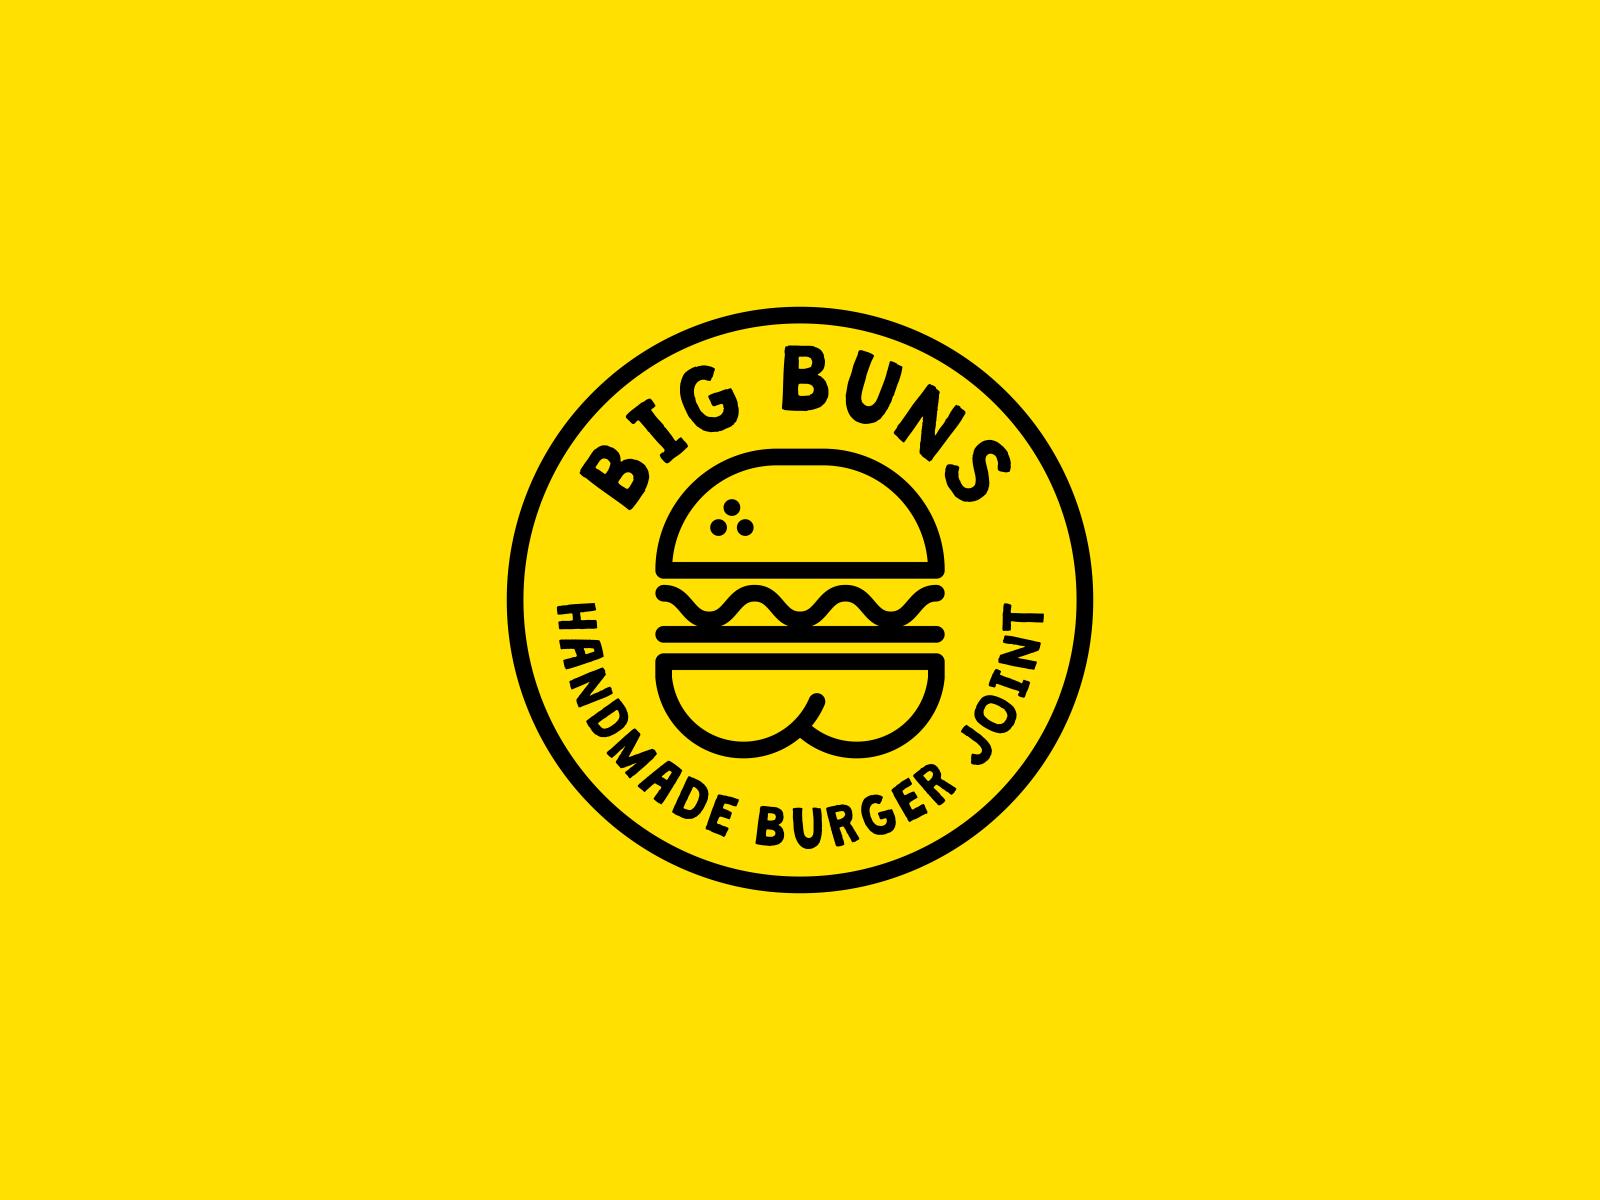 Dailylogochallenge bigbuns burger b logo dribbble nickbudrewiczdesign 01